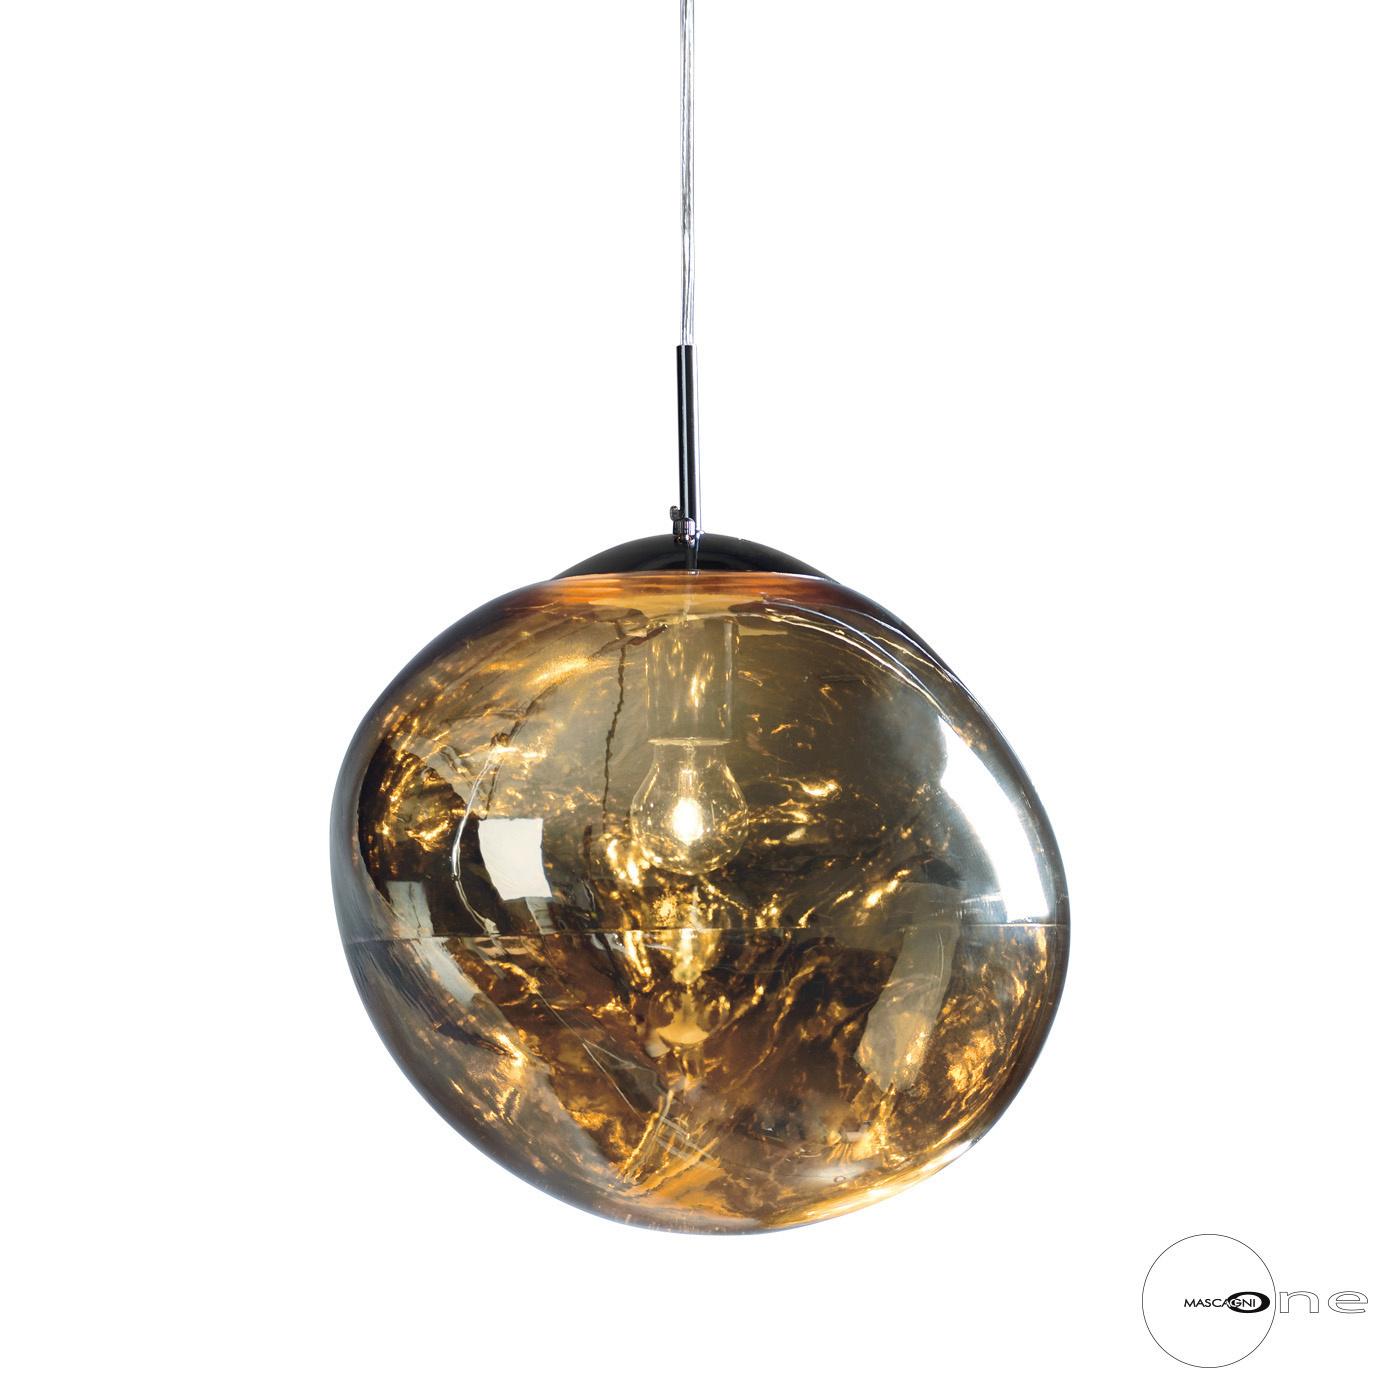 Art Mascagni O1491 CEILING LAMP DIAM.36 - COL.GOLD